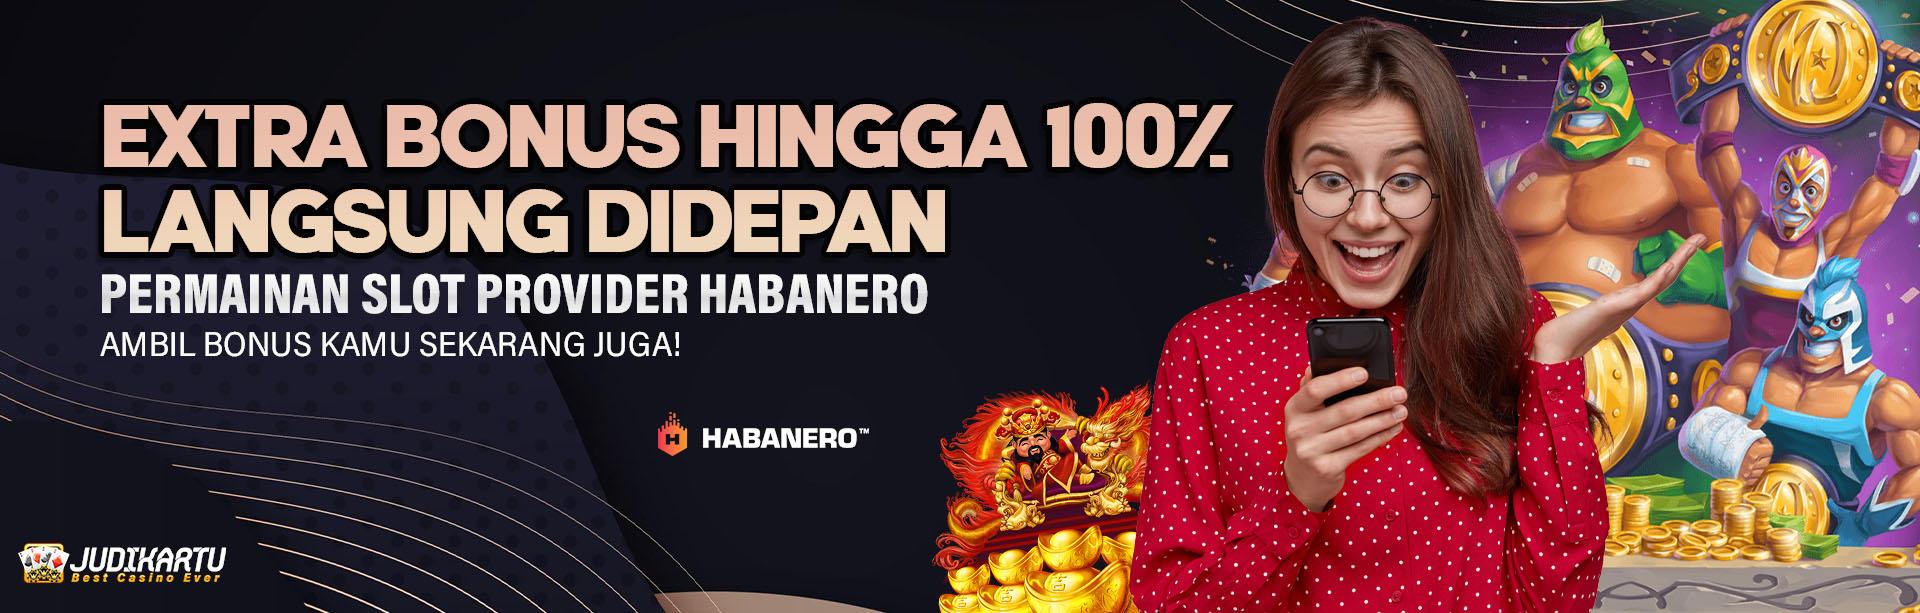 EXTRA BONUS HINGGA 100% HABANERO